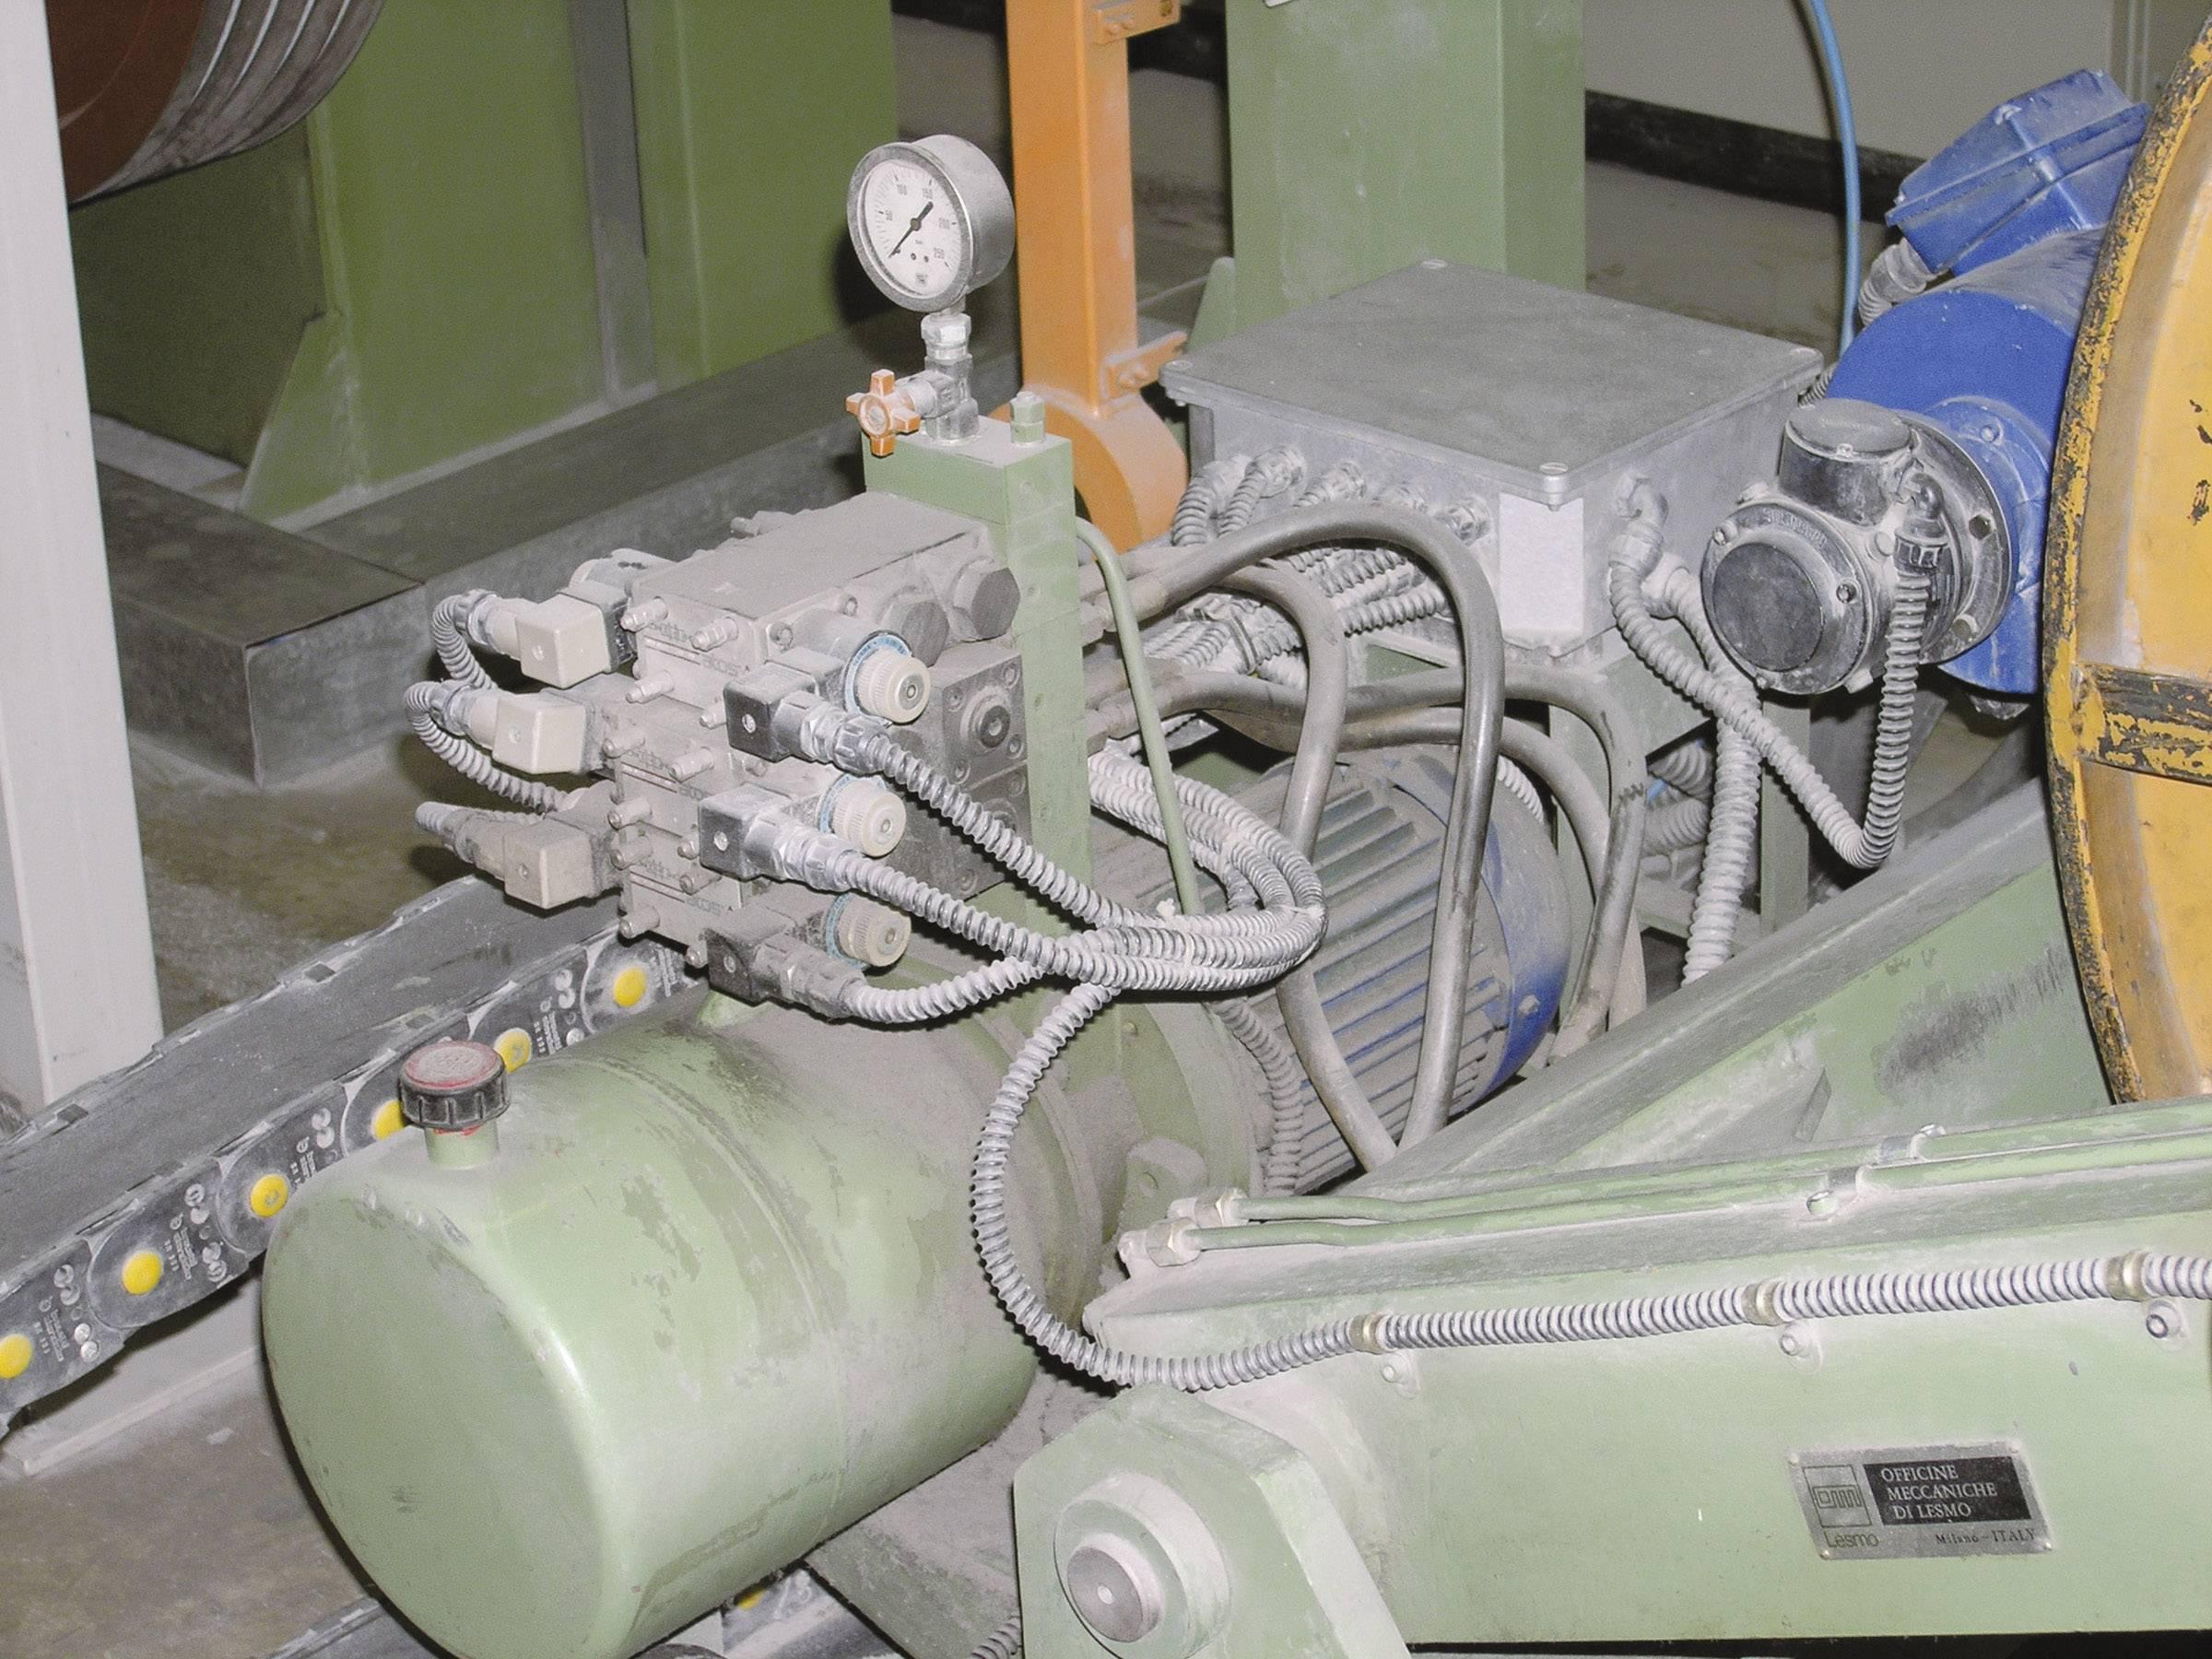 Vlnitá trubka LappKabel SILVYN® EL 22x27,7 SGY 61747390, 22 mm, stříbrnošedá (RAL 7001), 10 m